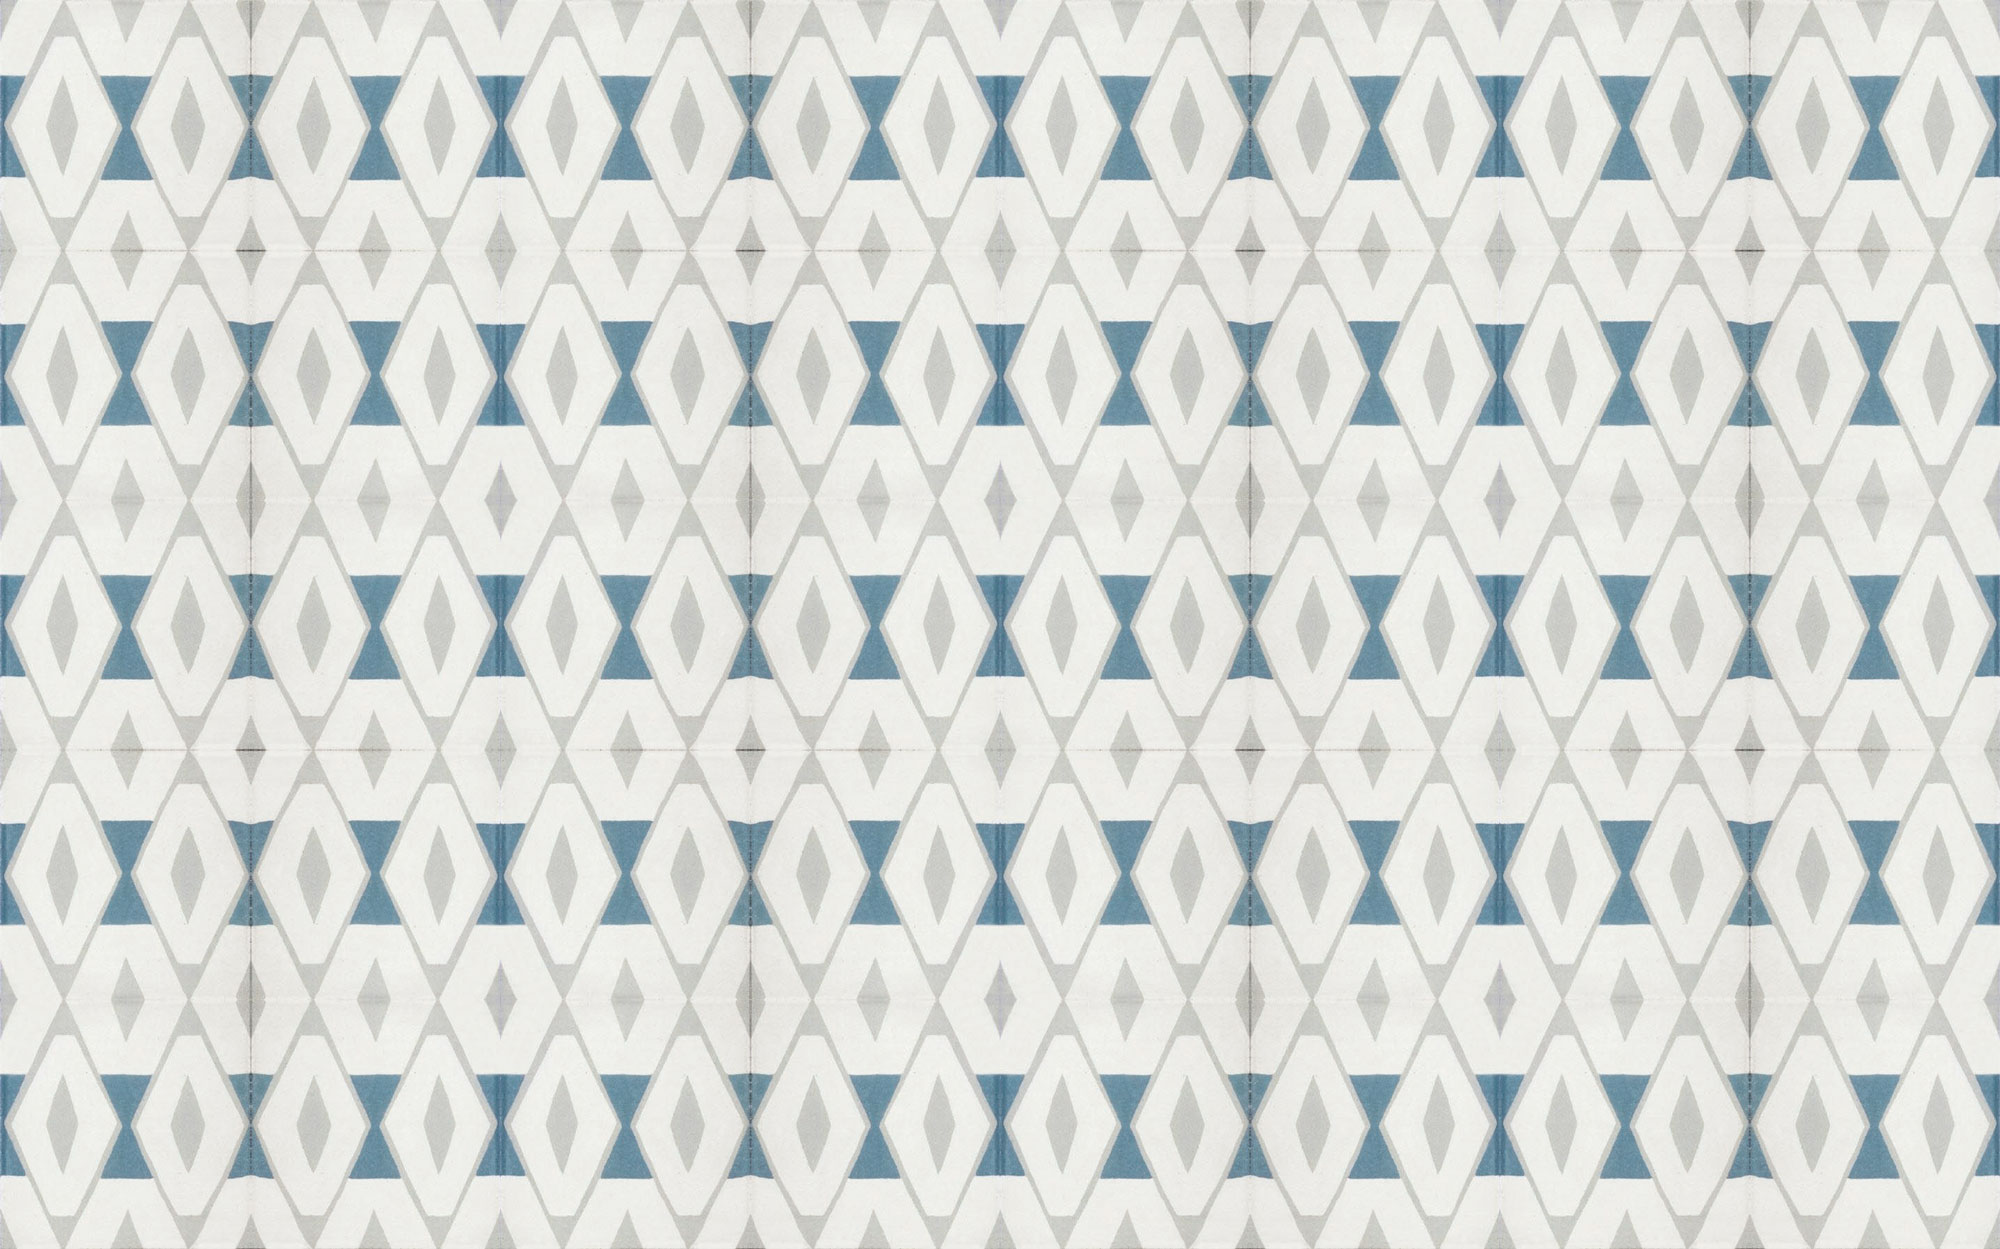 francisco-toledo-triangulos-azules